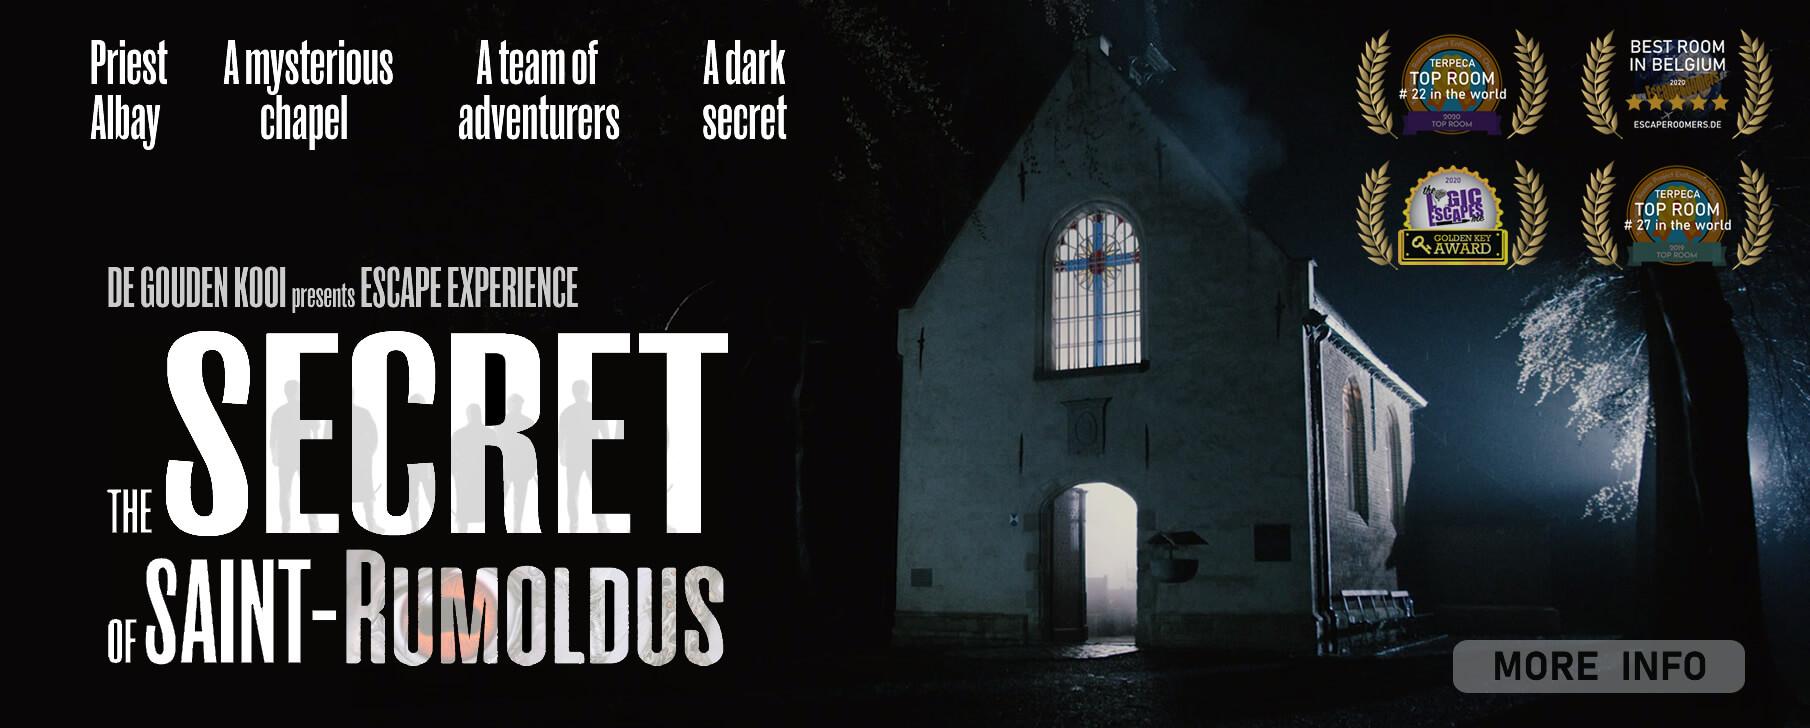 De Gouden Kooi escape experience - The secret of saint-Rumoldus